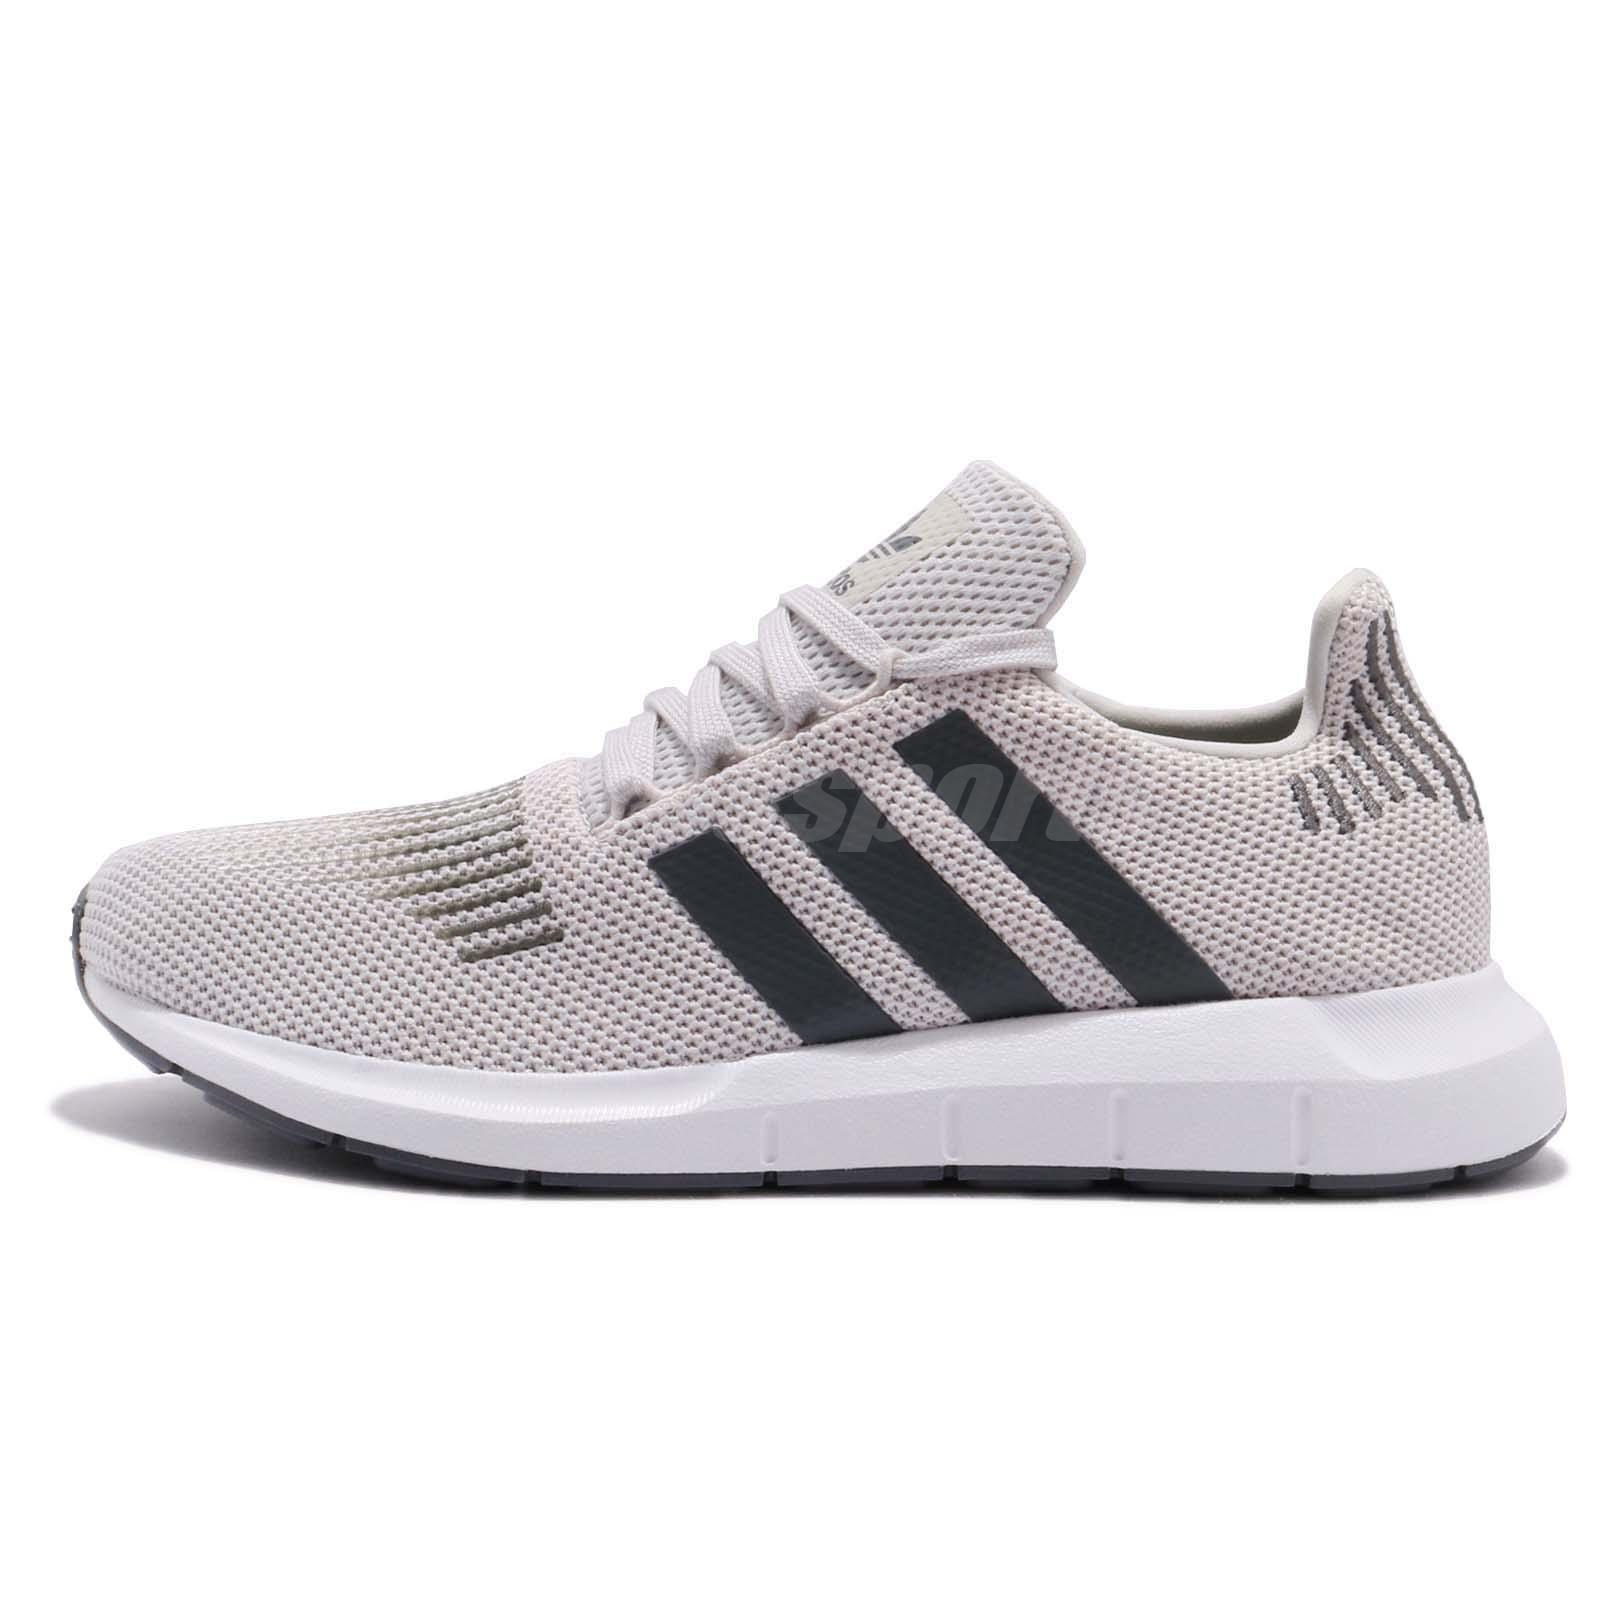 ddd055217 adidas Originals Swift Run Grey Men Running Shoes Sneakers Trainers CQ2109